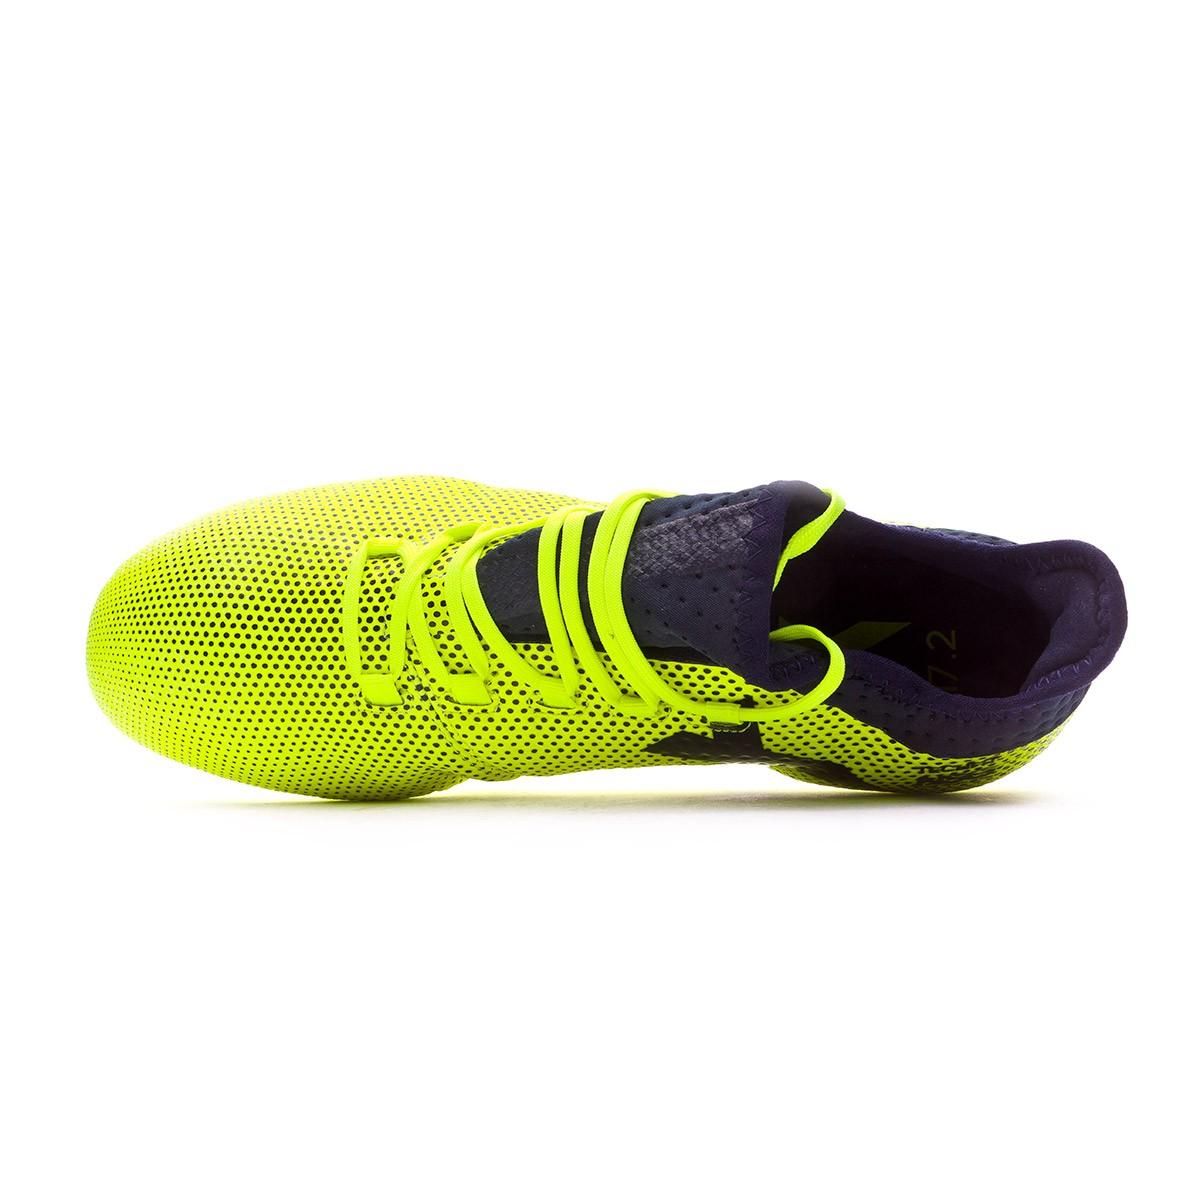 Boot adidas X 17.2 SG Solar yellow-Legend ink - Football store ... 3710c3dc95